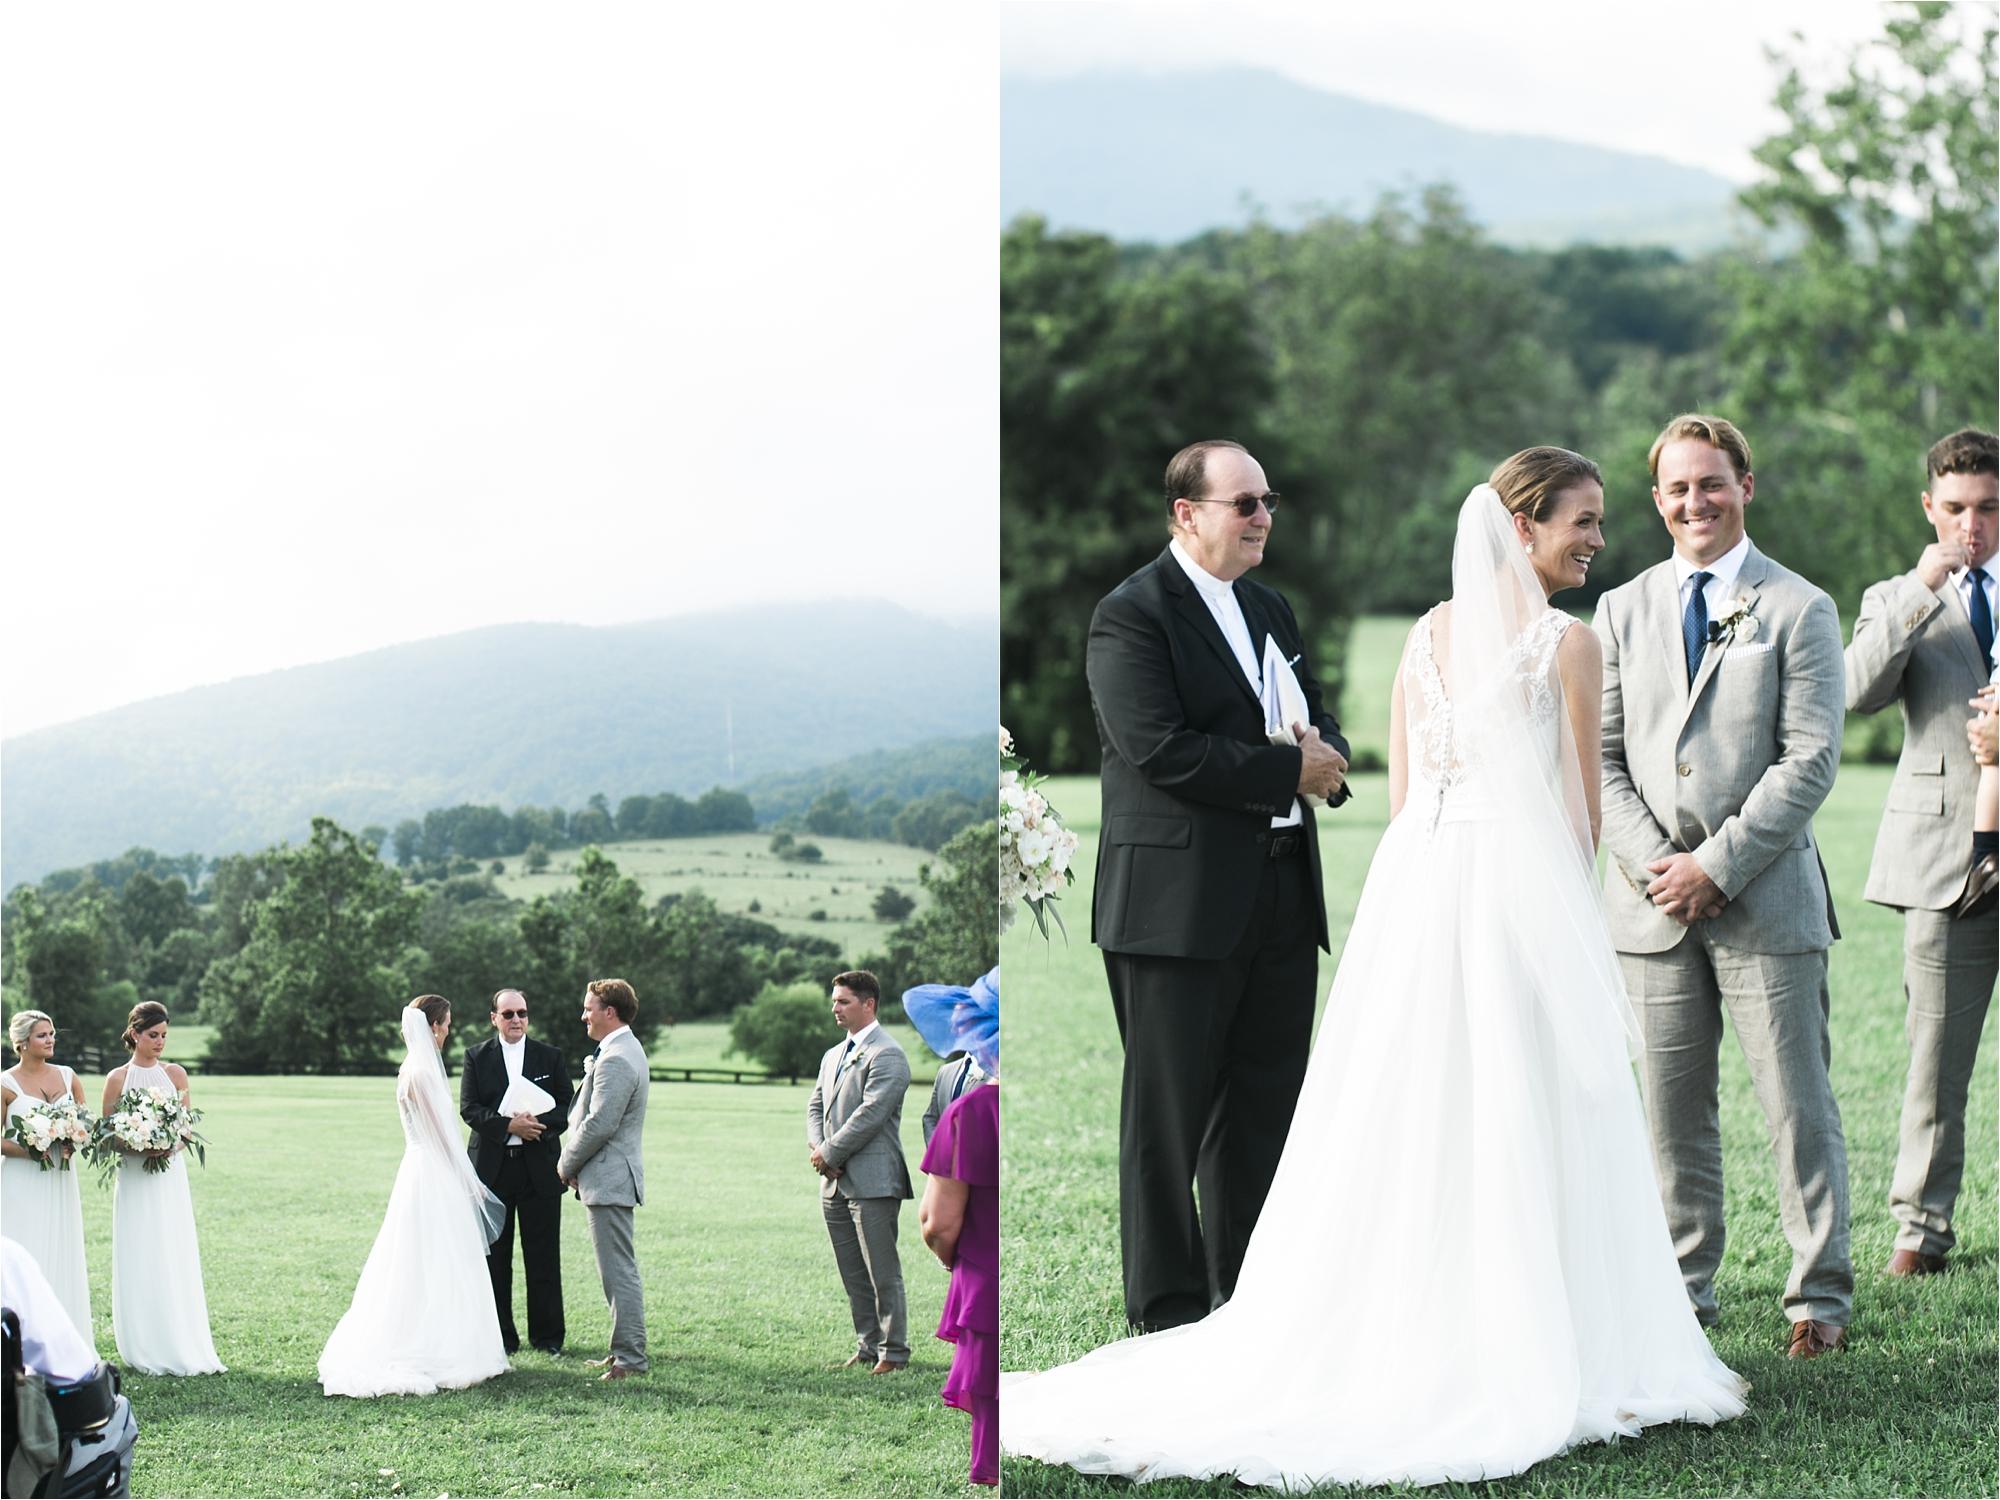 stephanie-yonce-charlottesville-virginia-king-family-vineyard-wedding-photos_0032.jpg